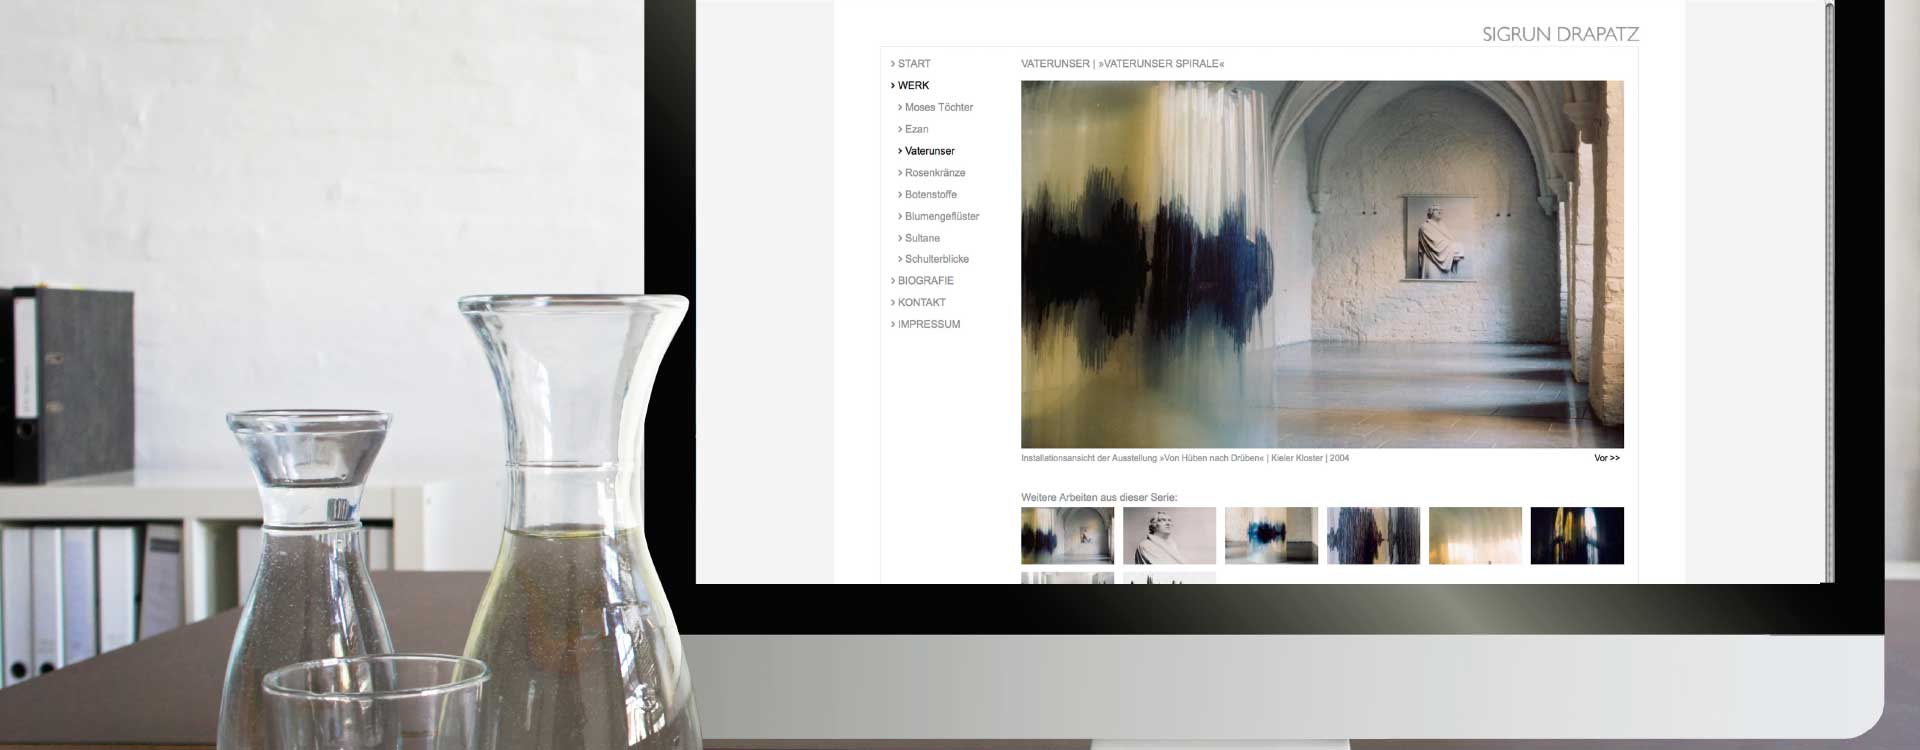 Website for the art of Sigrun Drapatz; Design: Kattrin Richter | Graphic Design Studio